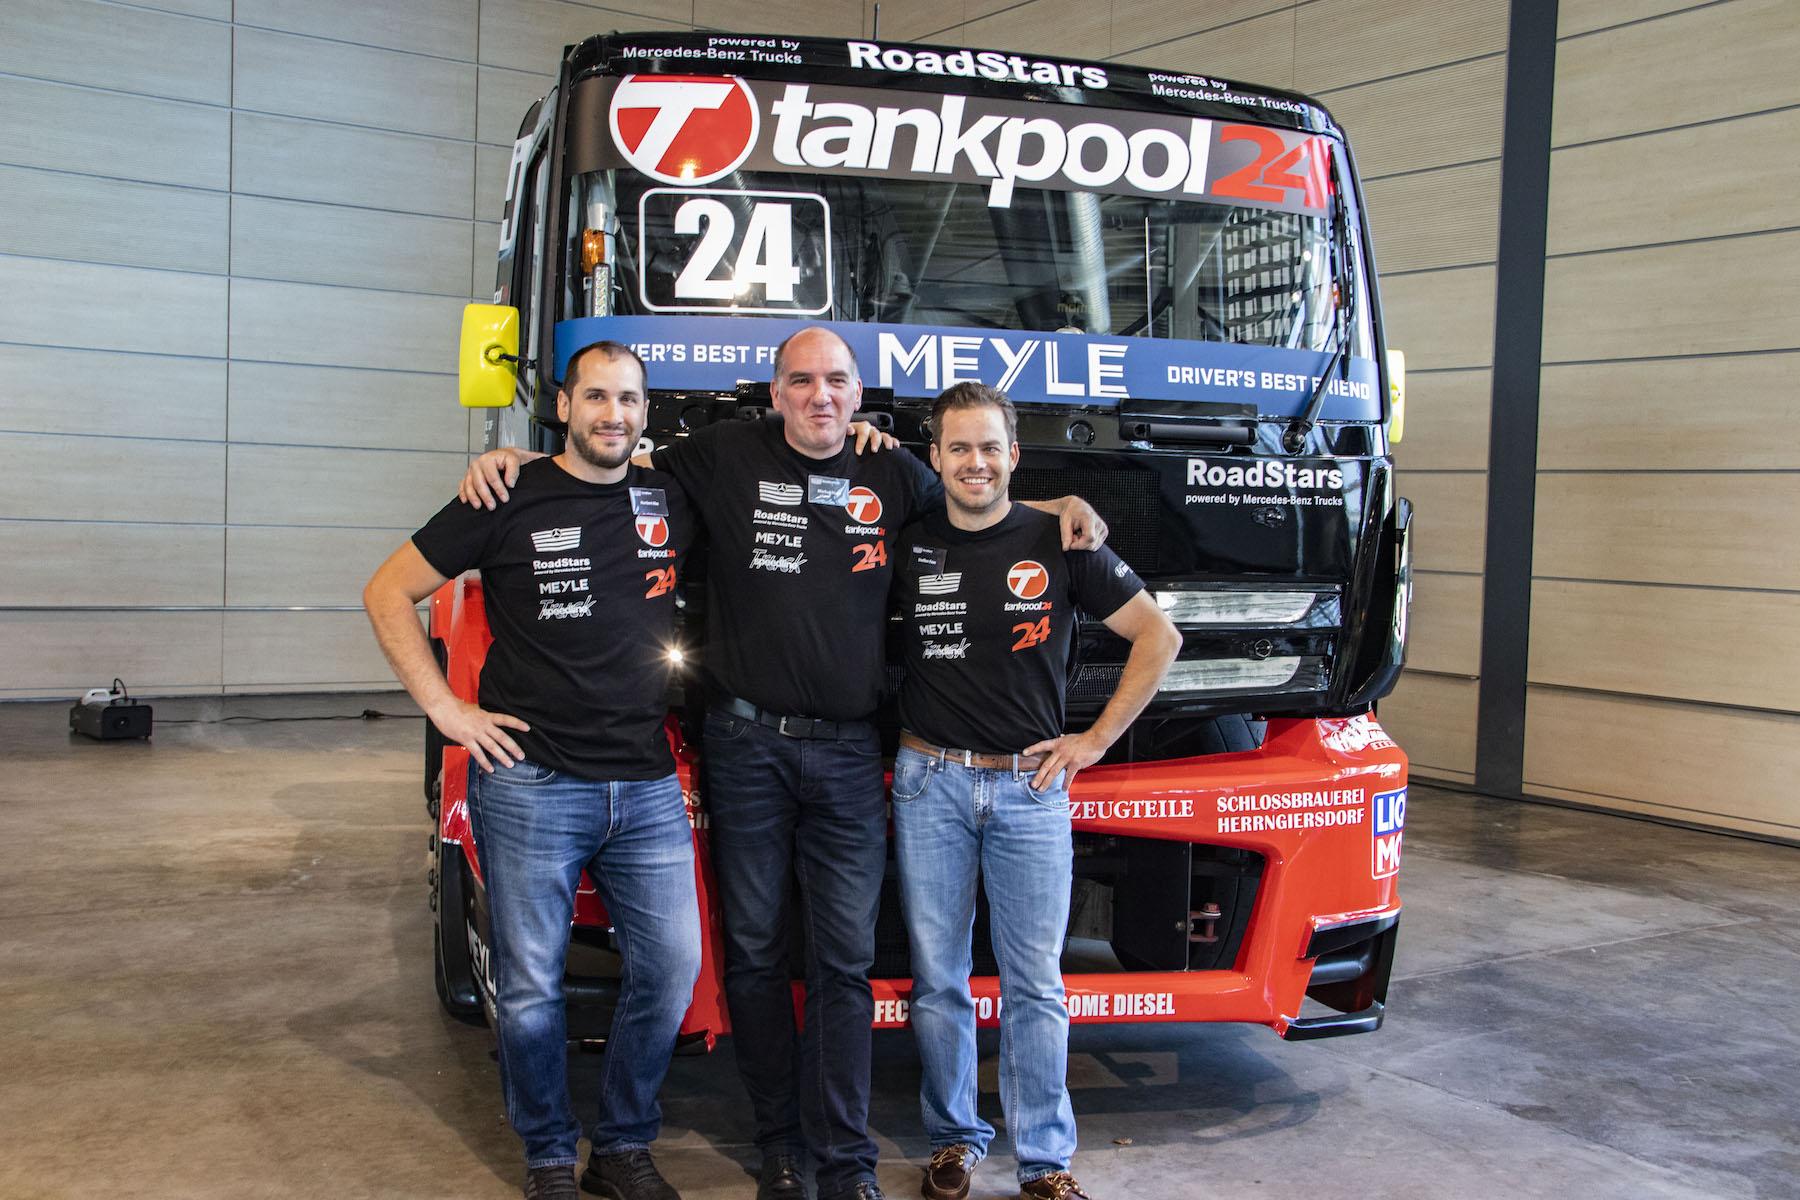 Kiss Norbi, Steffen Faas, Marcus Bauer, Tankpool24, Mercedes